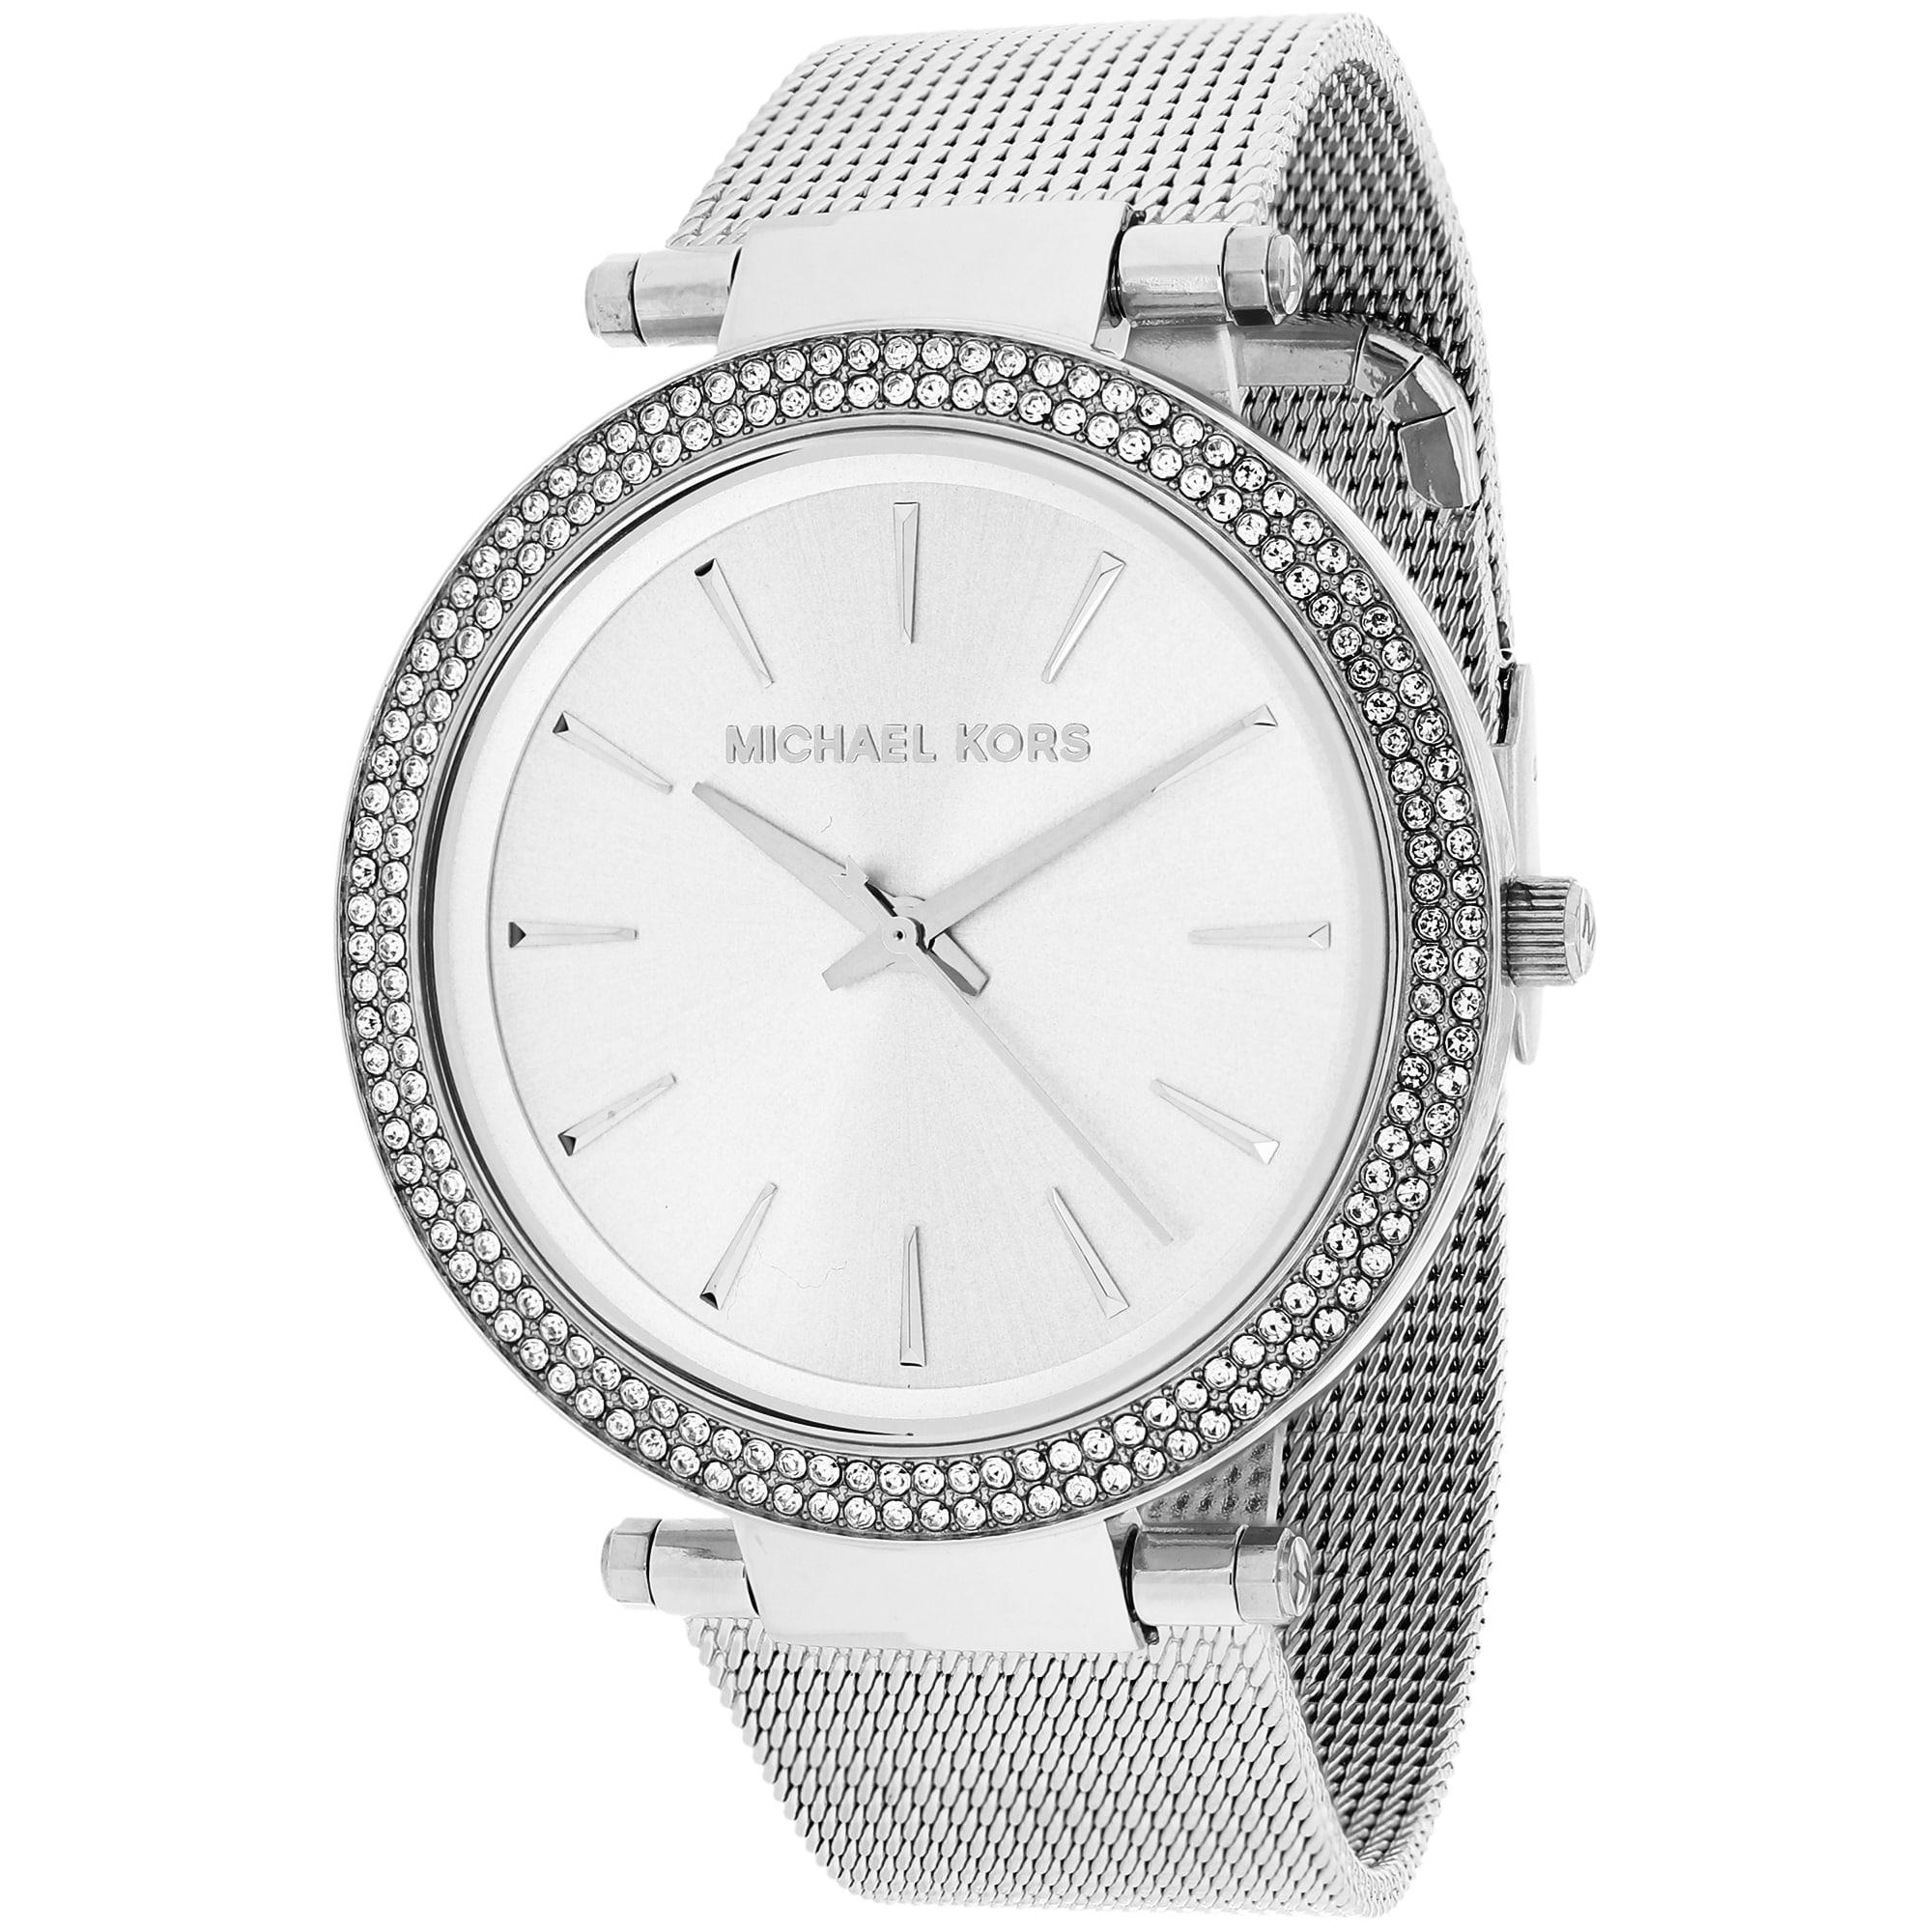 472a755d78a9 Shop Michael Kors Women s MK3367 Darci Round Silver Bracelet Watch - Free  Shipping Today - Overstock - 9920721